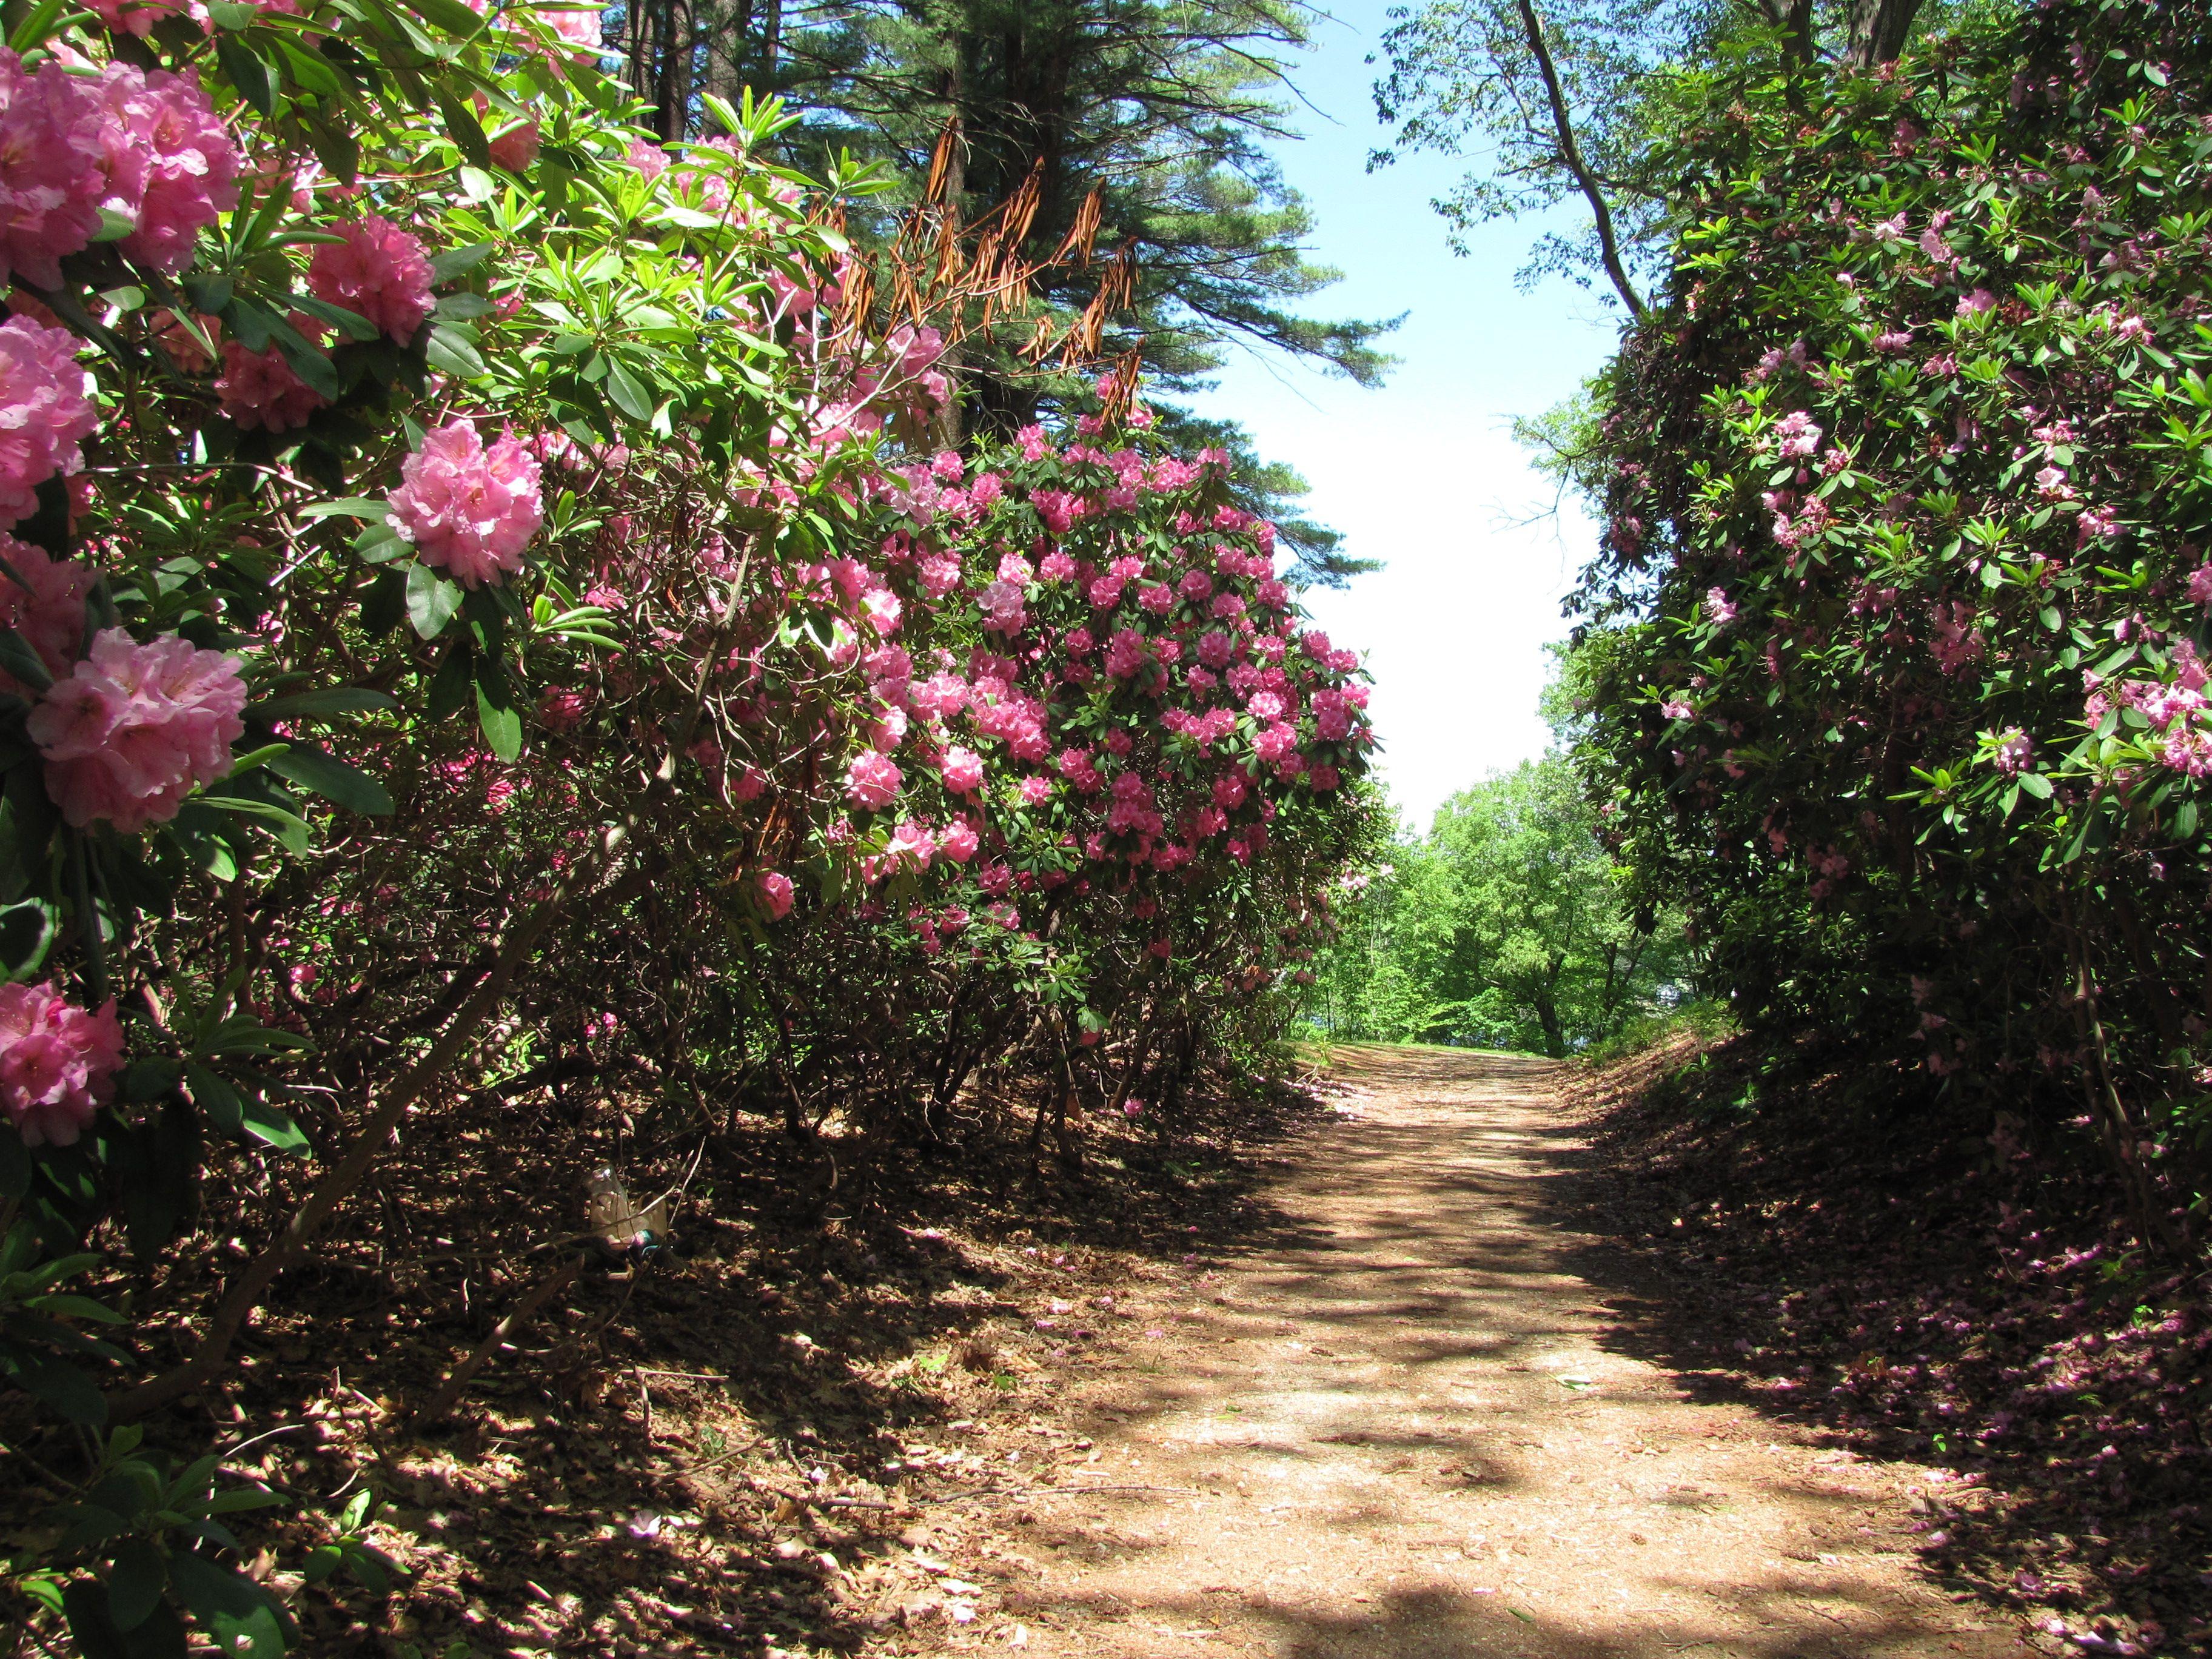 I Love Maudsley State Park In Newburyport Ma With It S